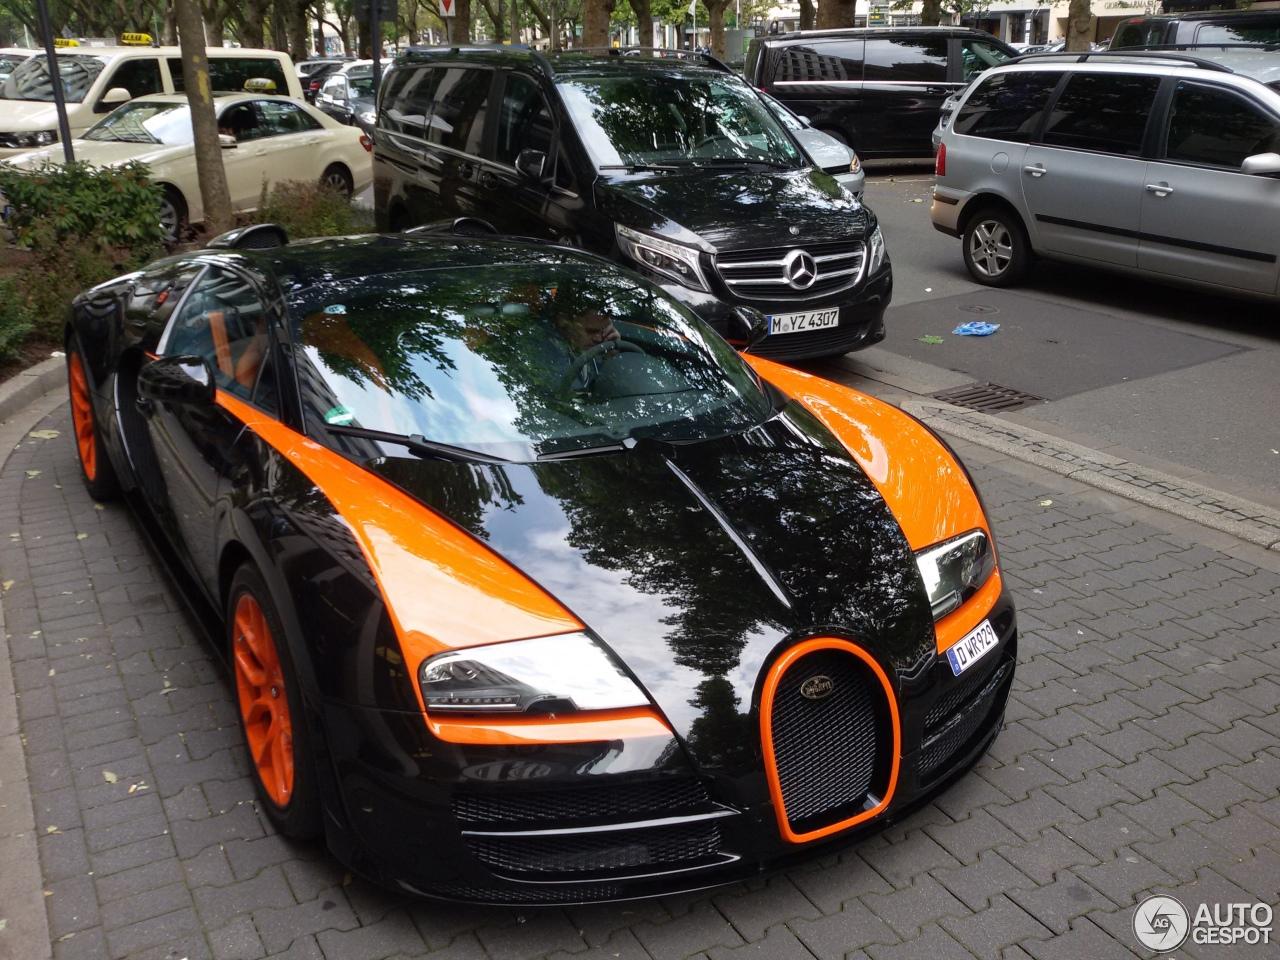 bugatti veyron 16 4 grand sport vitesse world record car edition 30 juli 2015 autogespot. Black Bedroom Furniture Sets. Home Design Ideas